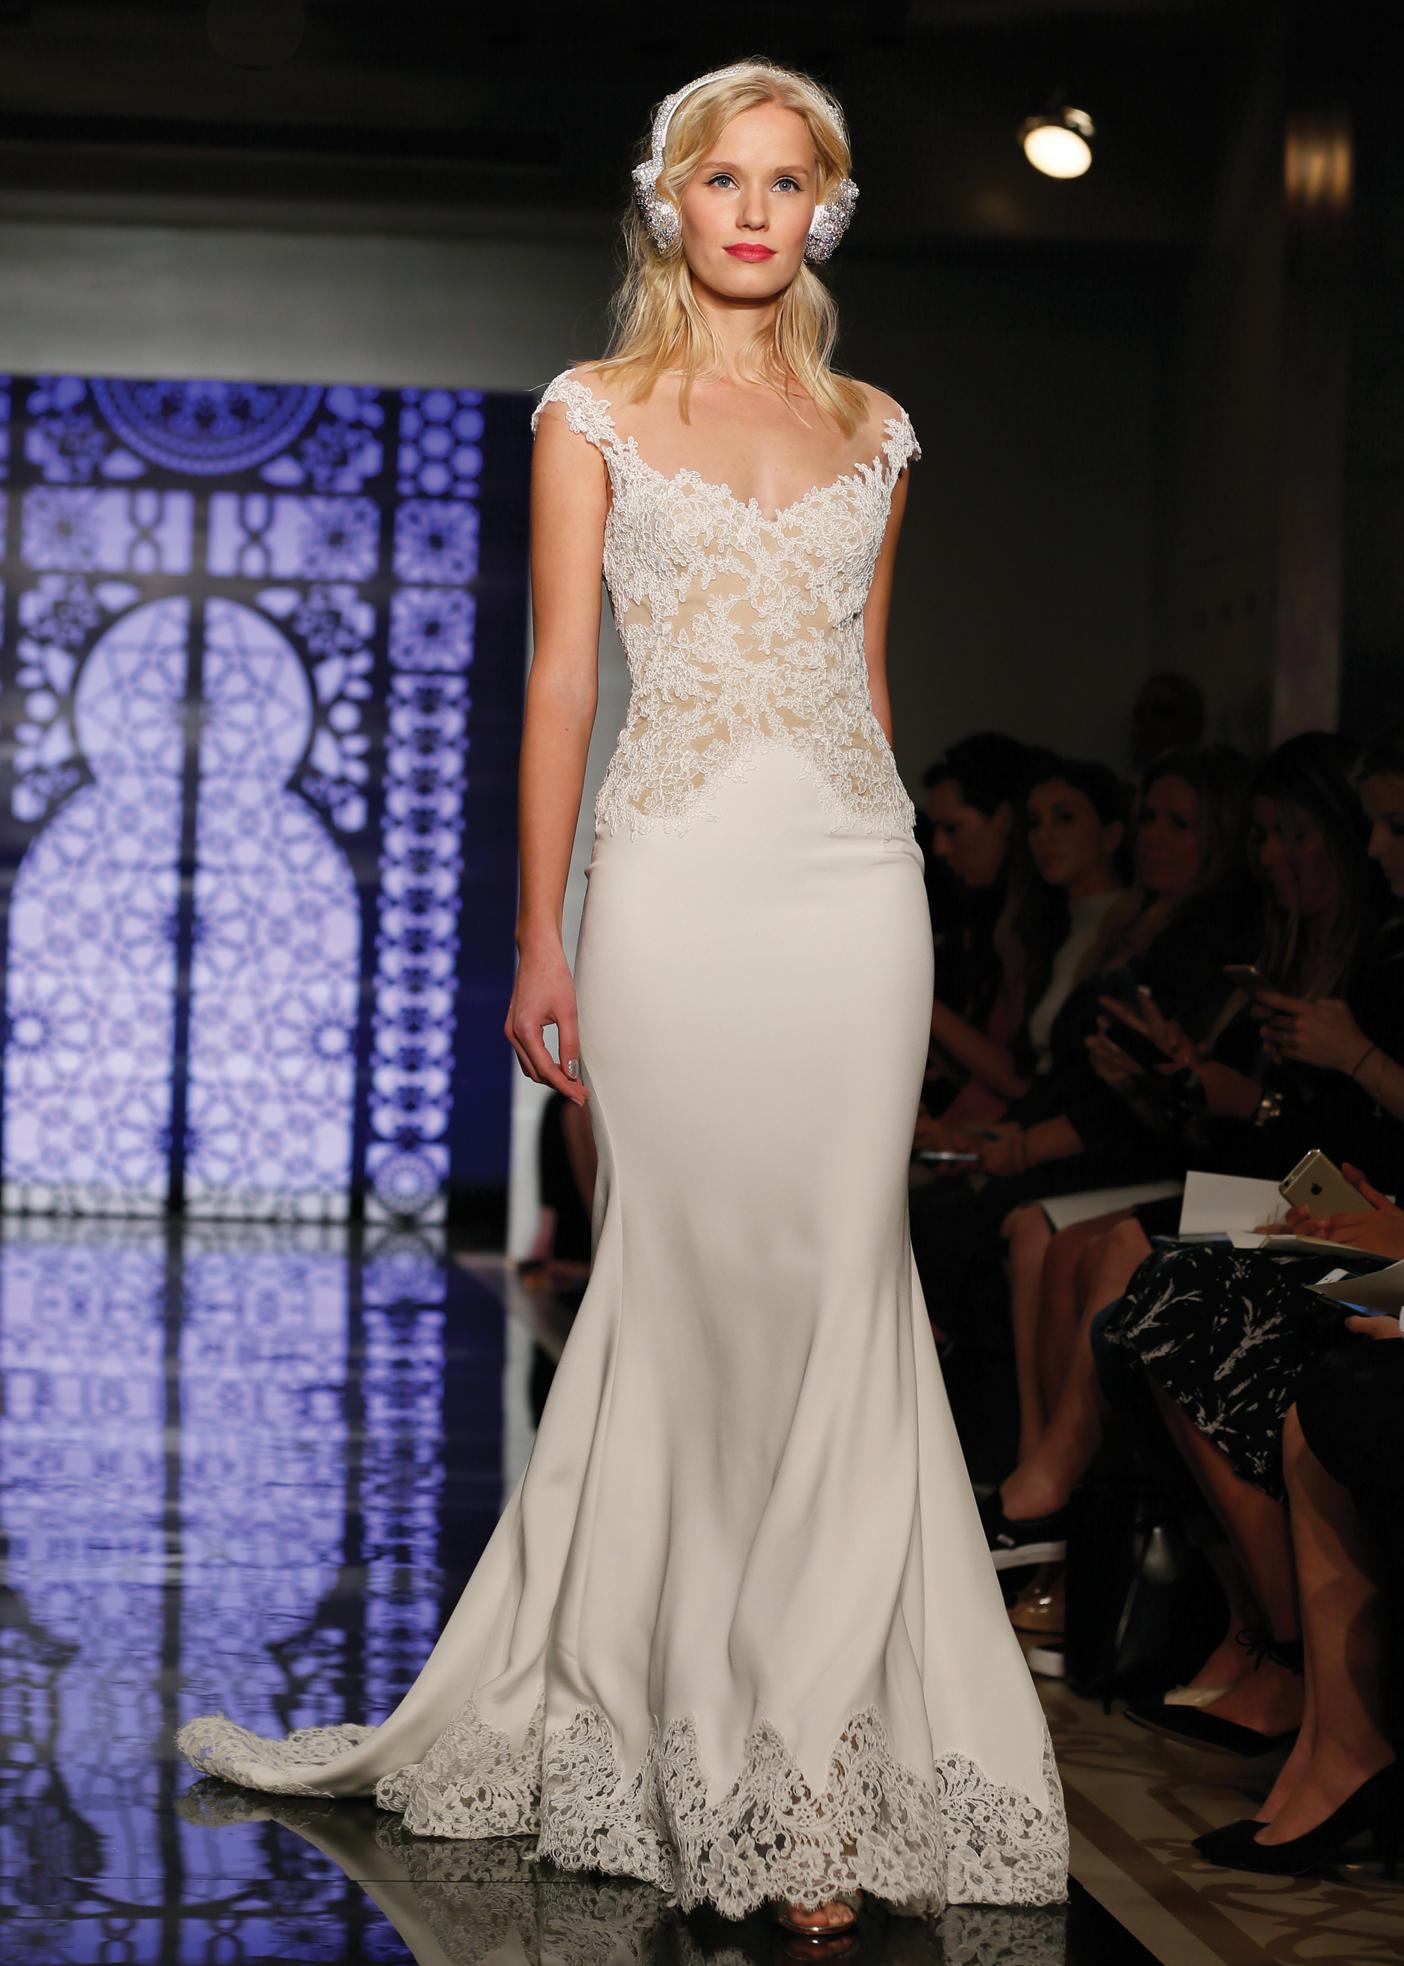 Mermaid Dress Bridal Wedding Gown by Reem Acra in NY, NJ